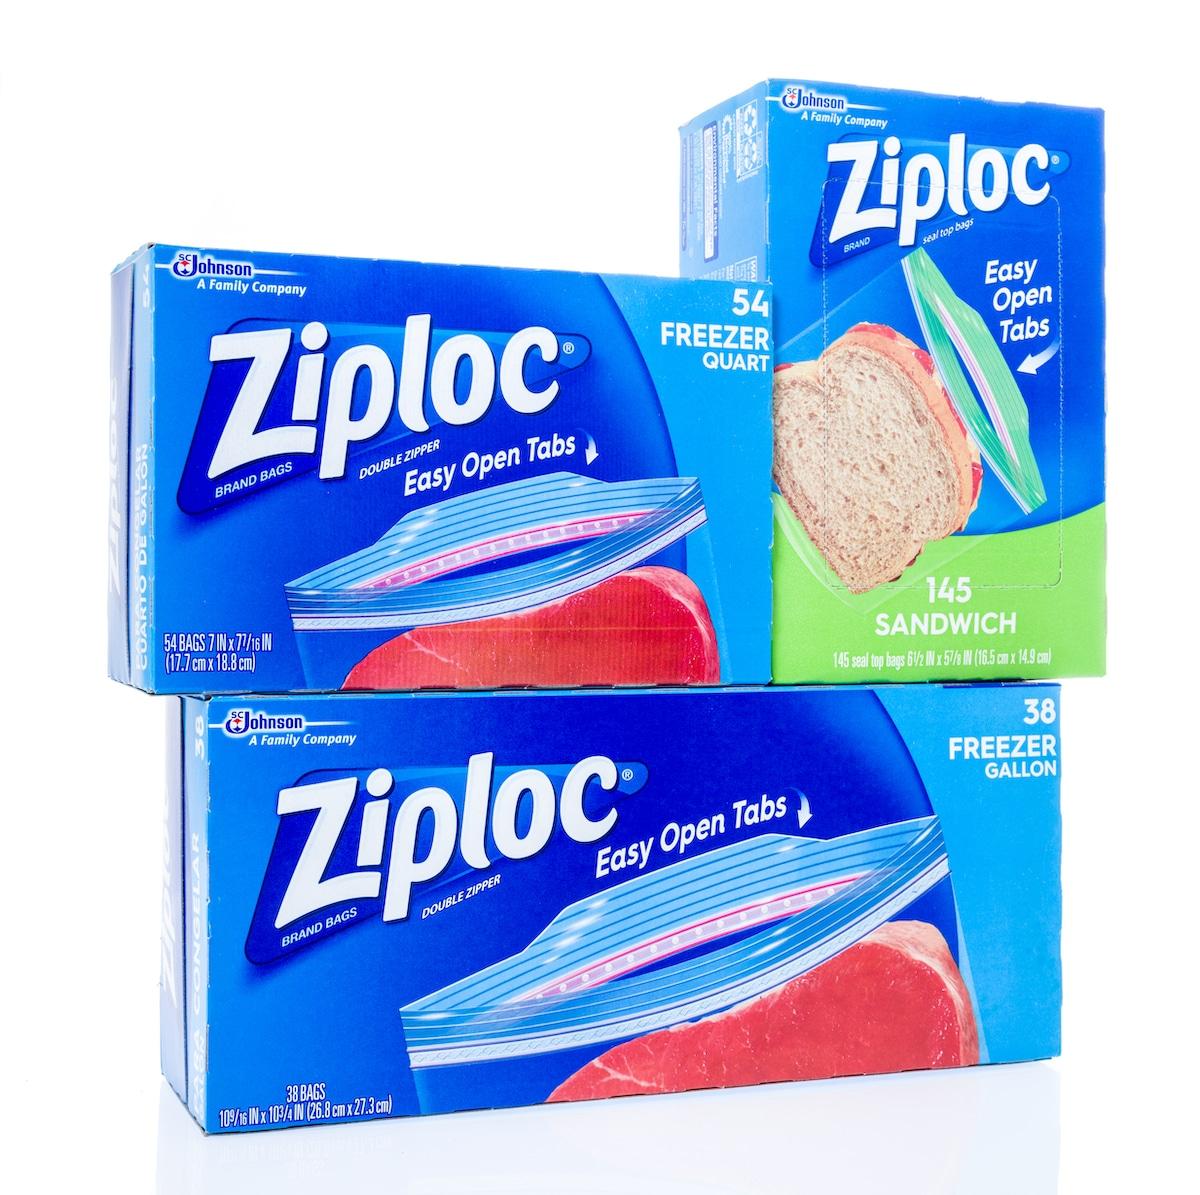 Zip loc bags